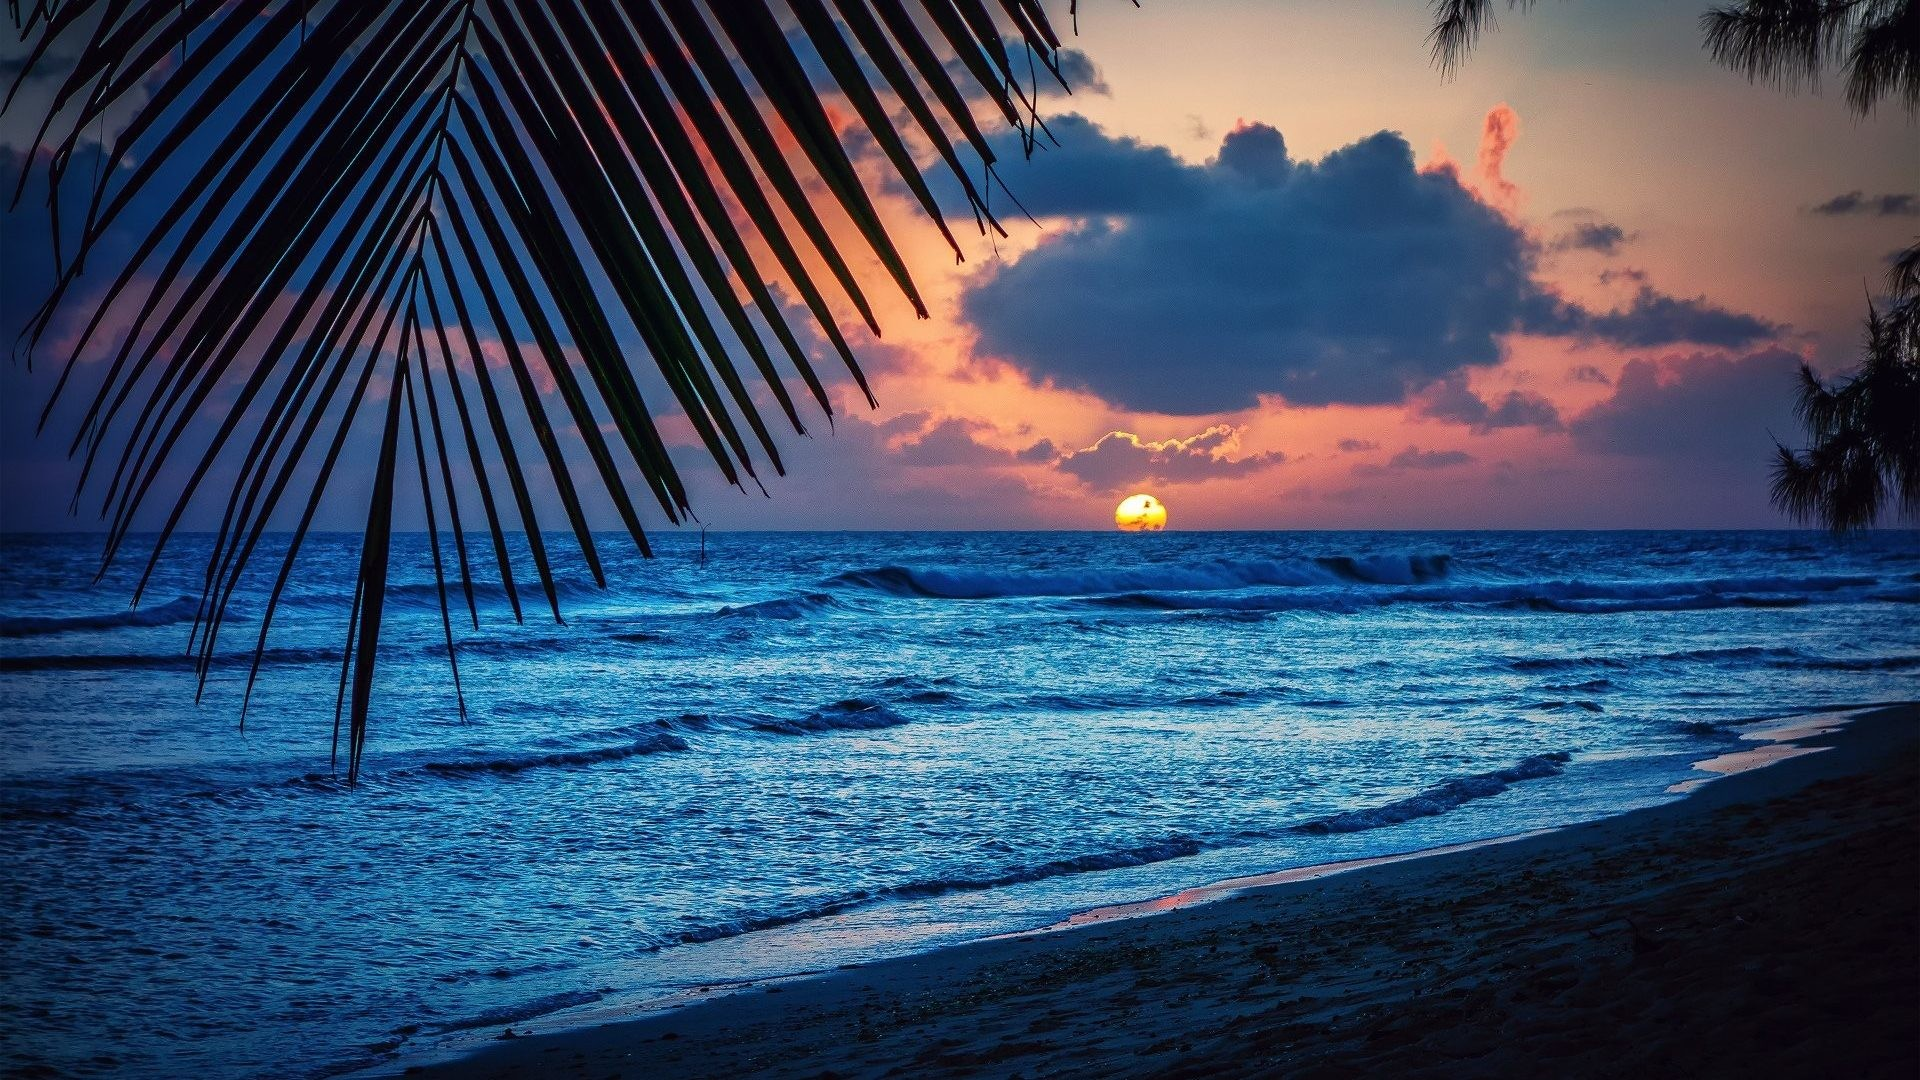 Caribbean wallpaper widescreen 61 images 1920x1080 sand clouds sunshades sea sky beautiful trees summer tropical palm beach caribbean white wallpaper tablet 1920x1084 voltagebd Choice Image